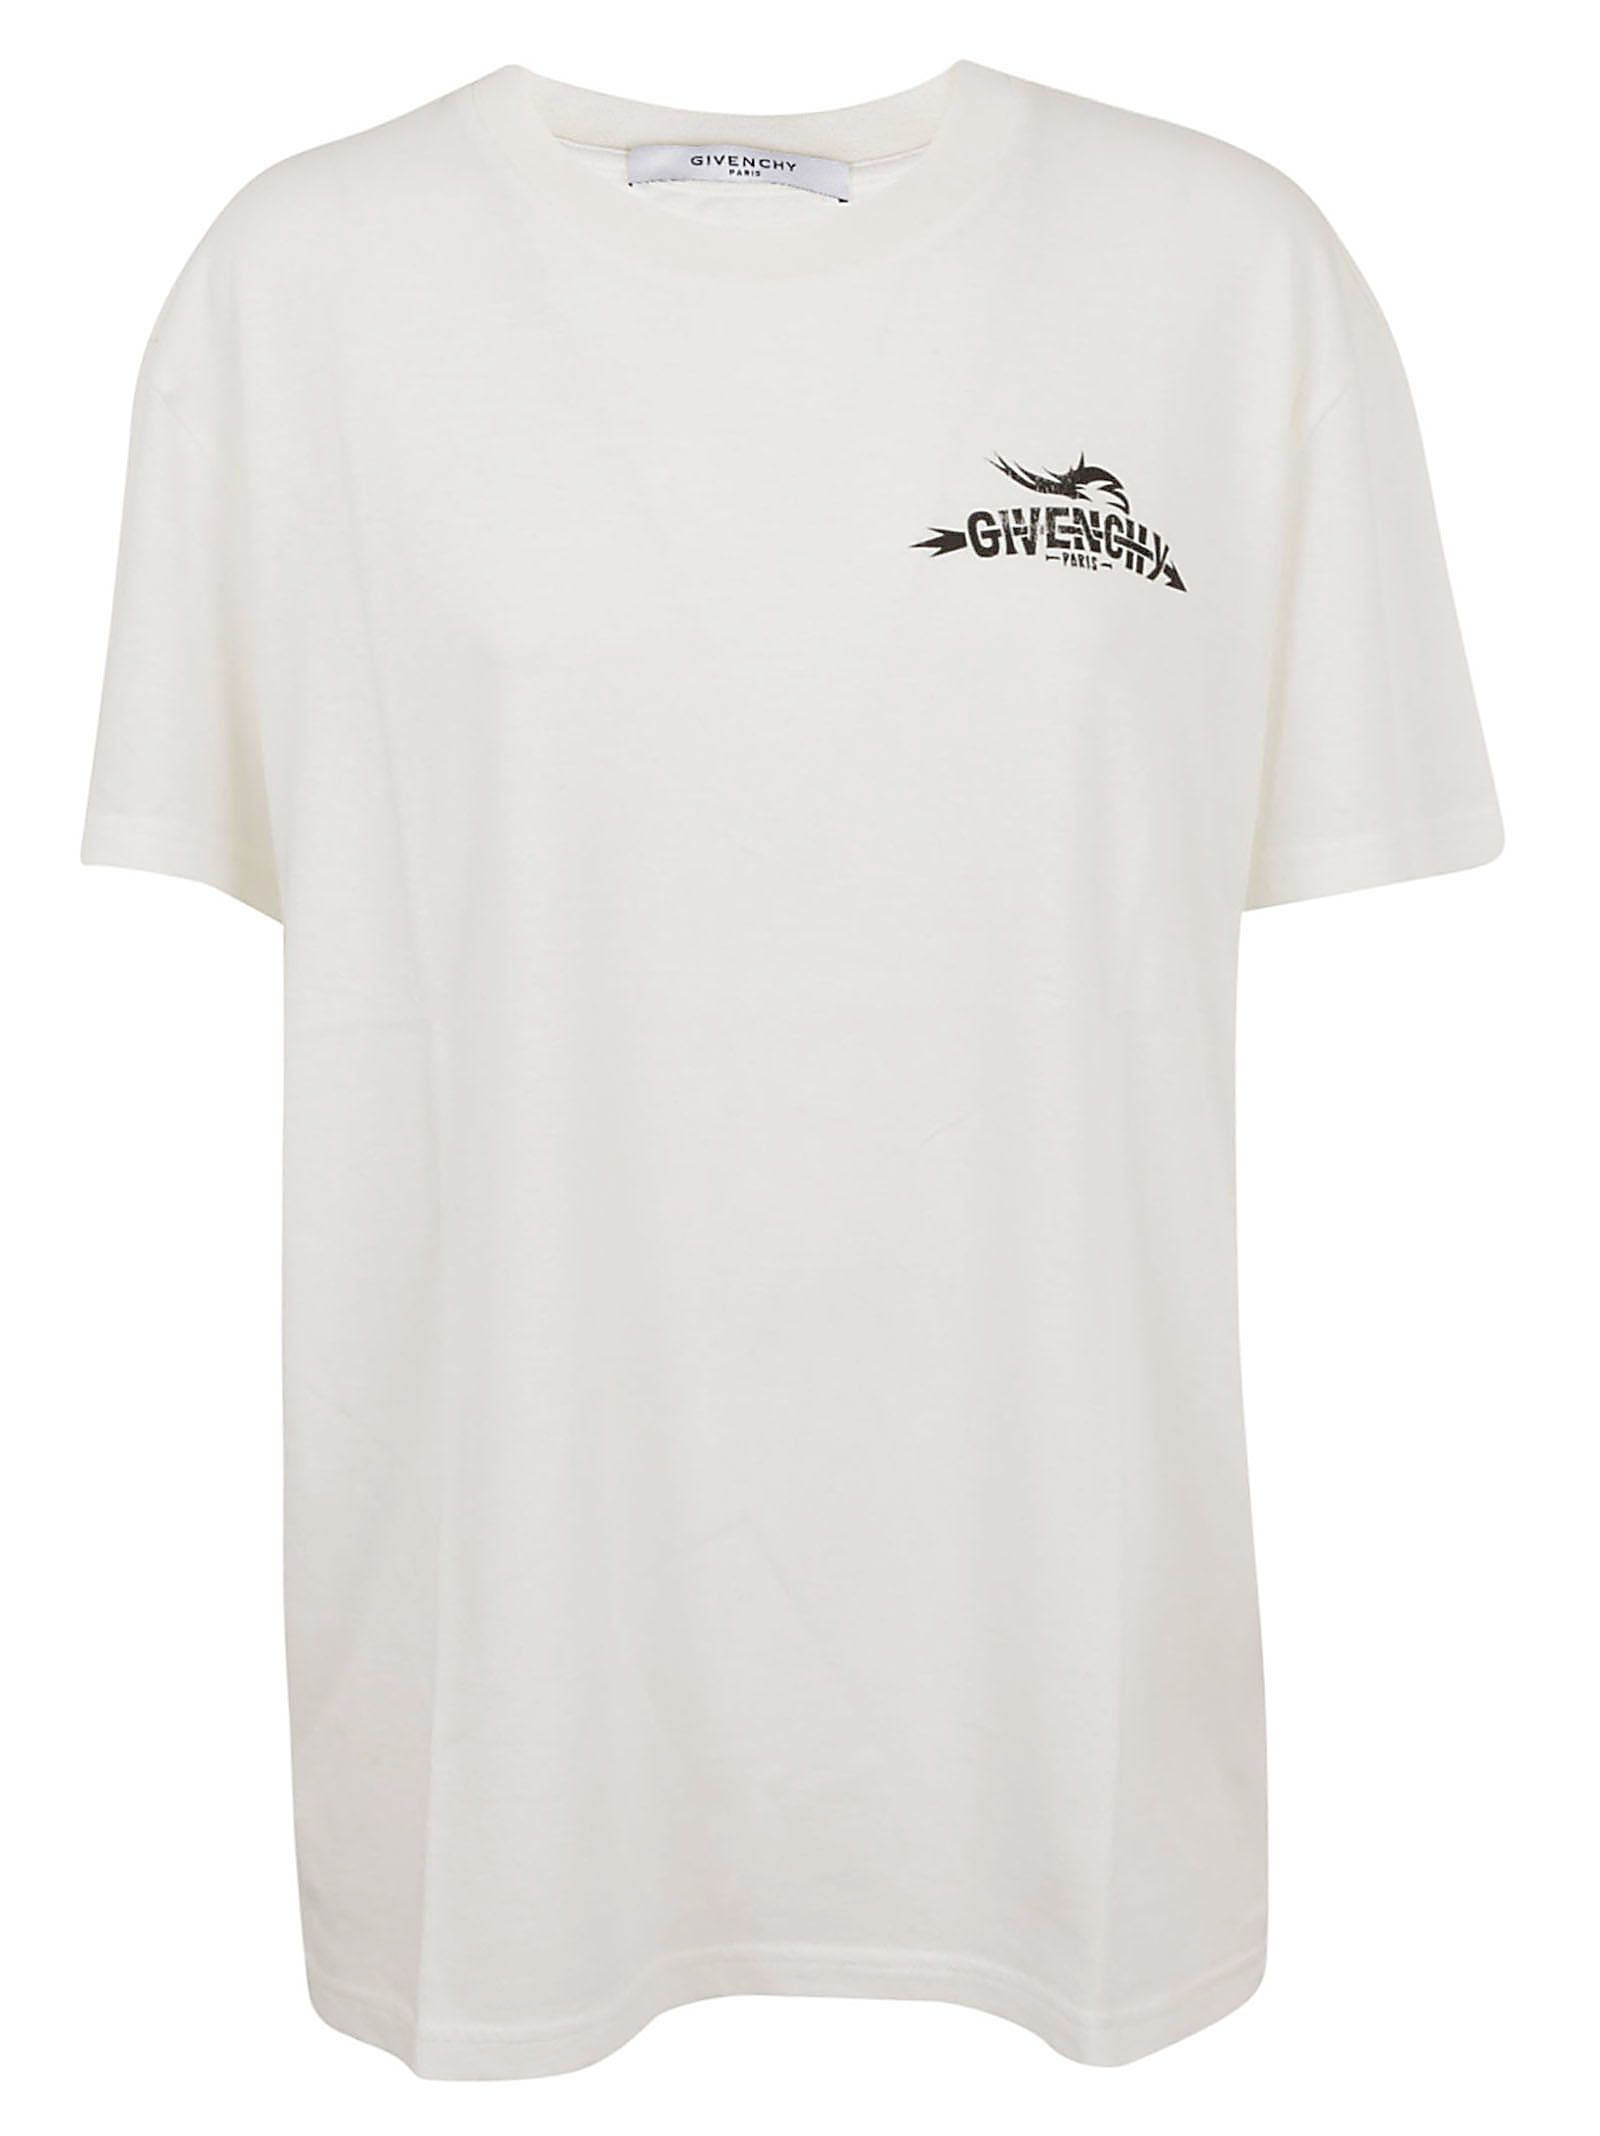 GIVENCHY   Givenchy Logo Printed T-shirt   Clouty